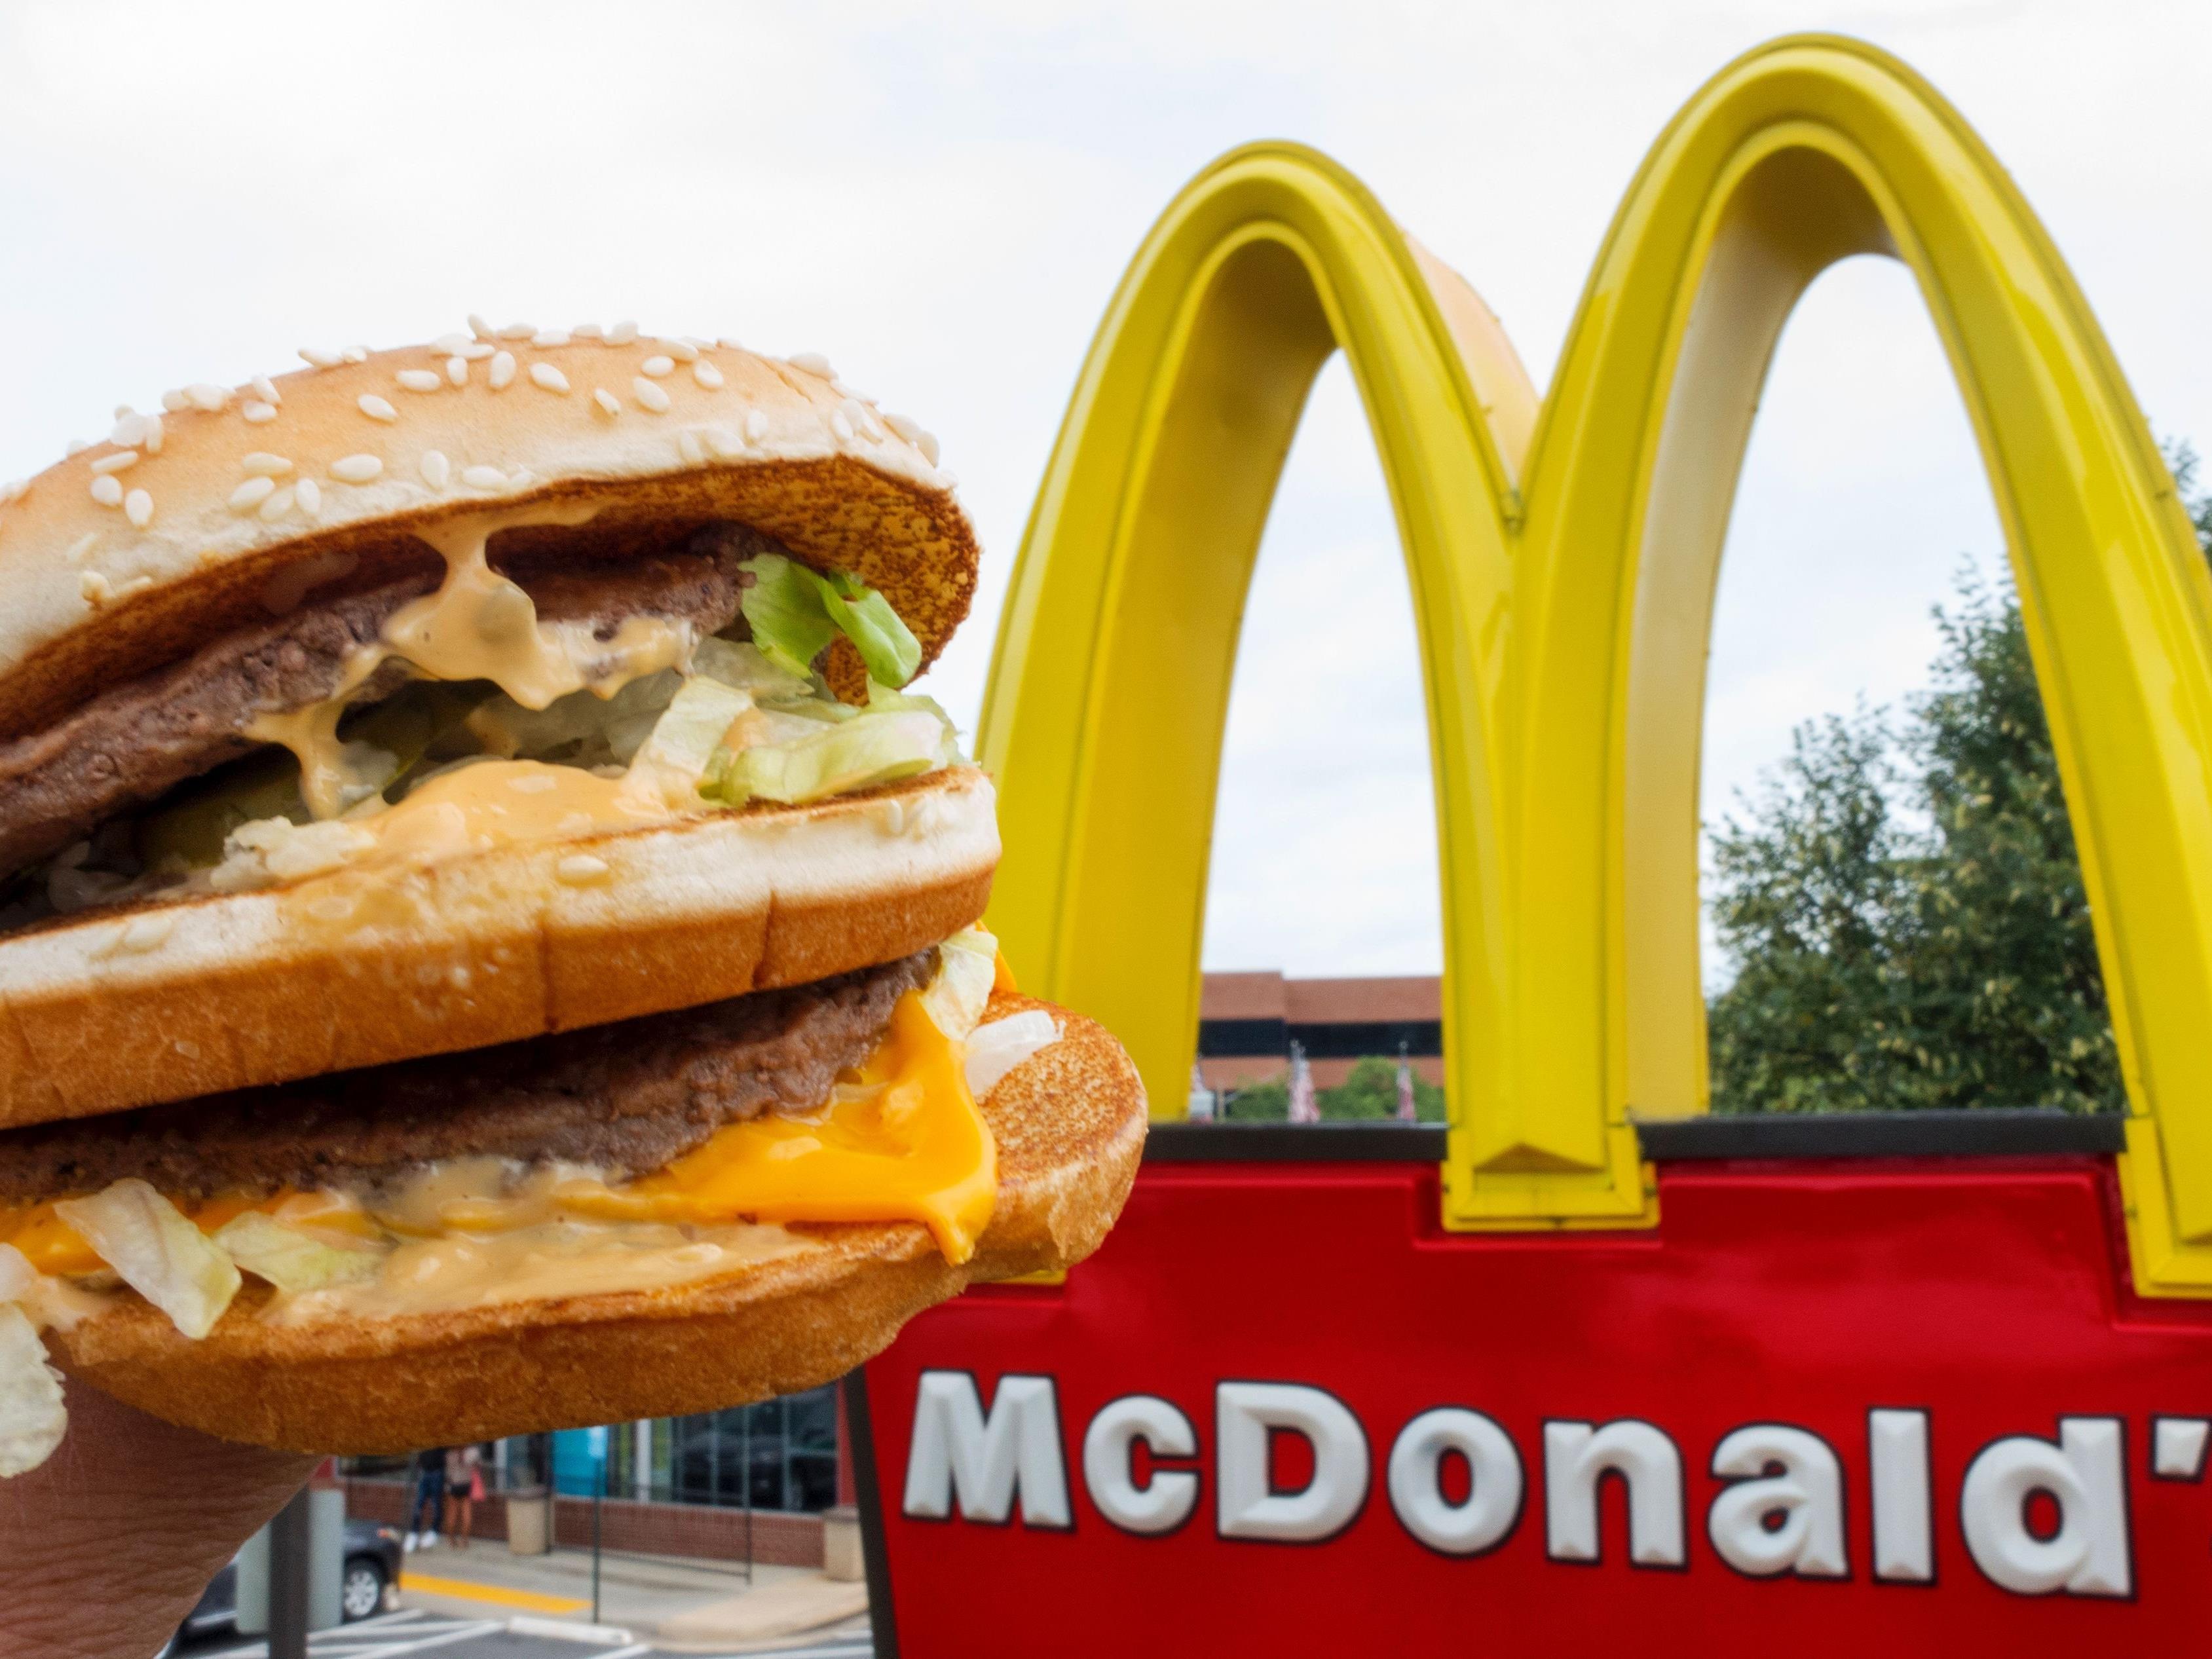 McDonald's beschreitet neue Wege.